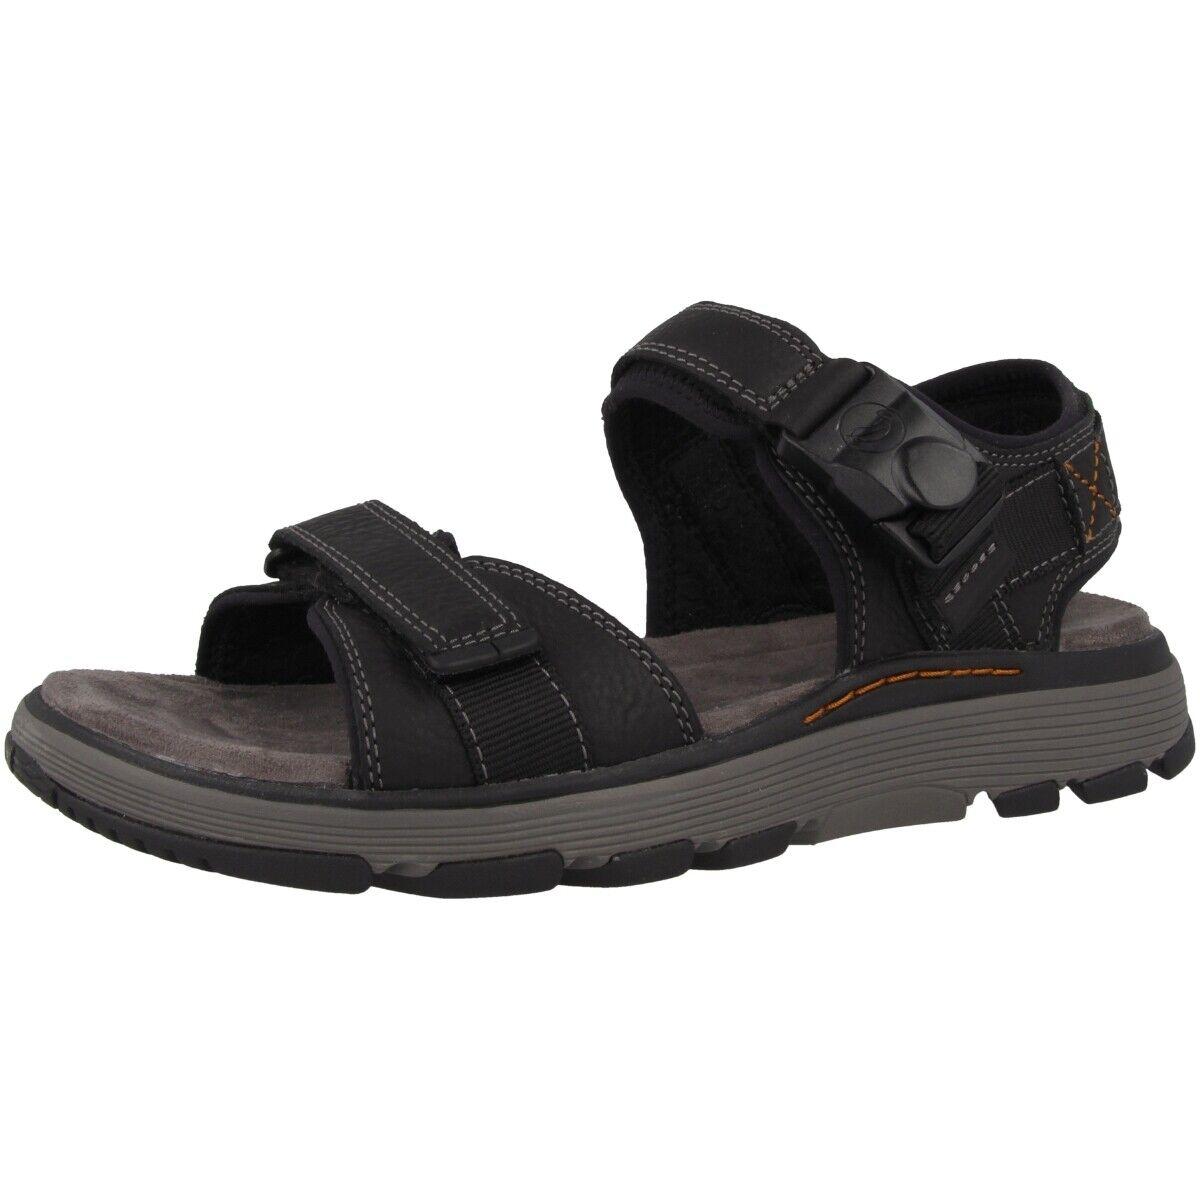 Clarks Un Trek Part Schuhe Men Herren Sandale Hiking Trail Sandalette 26132612